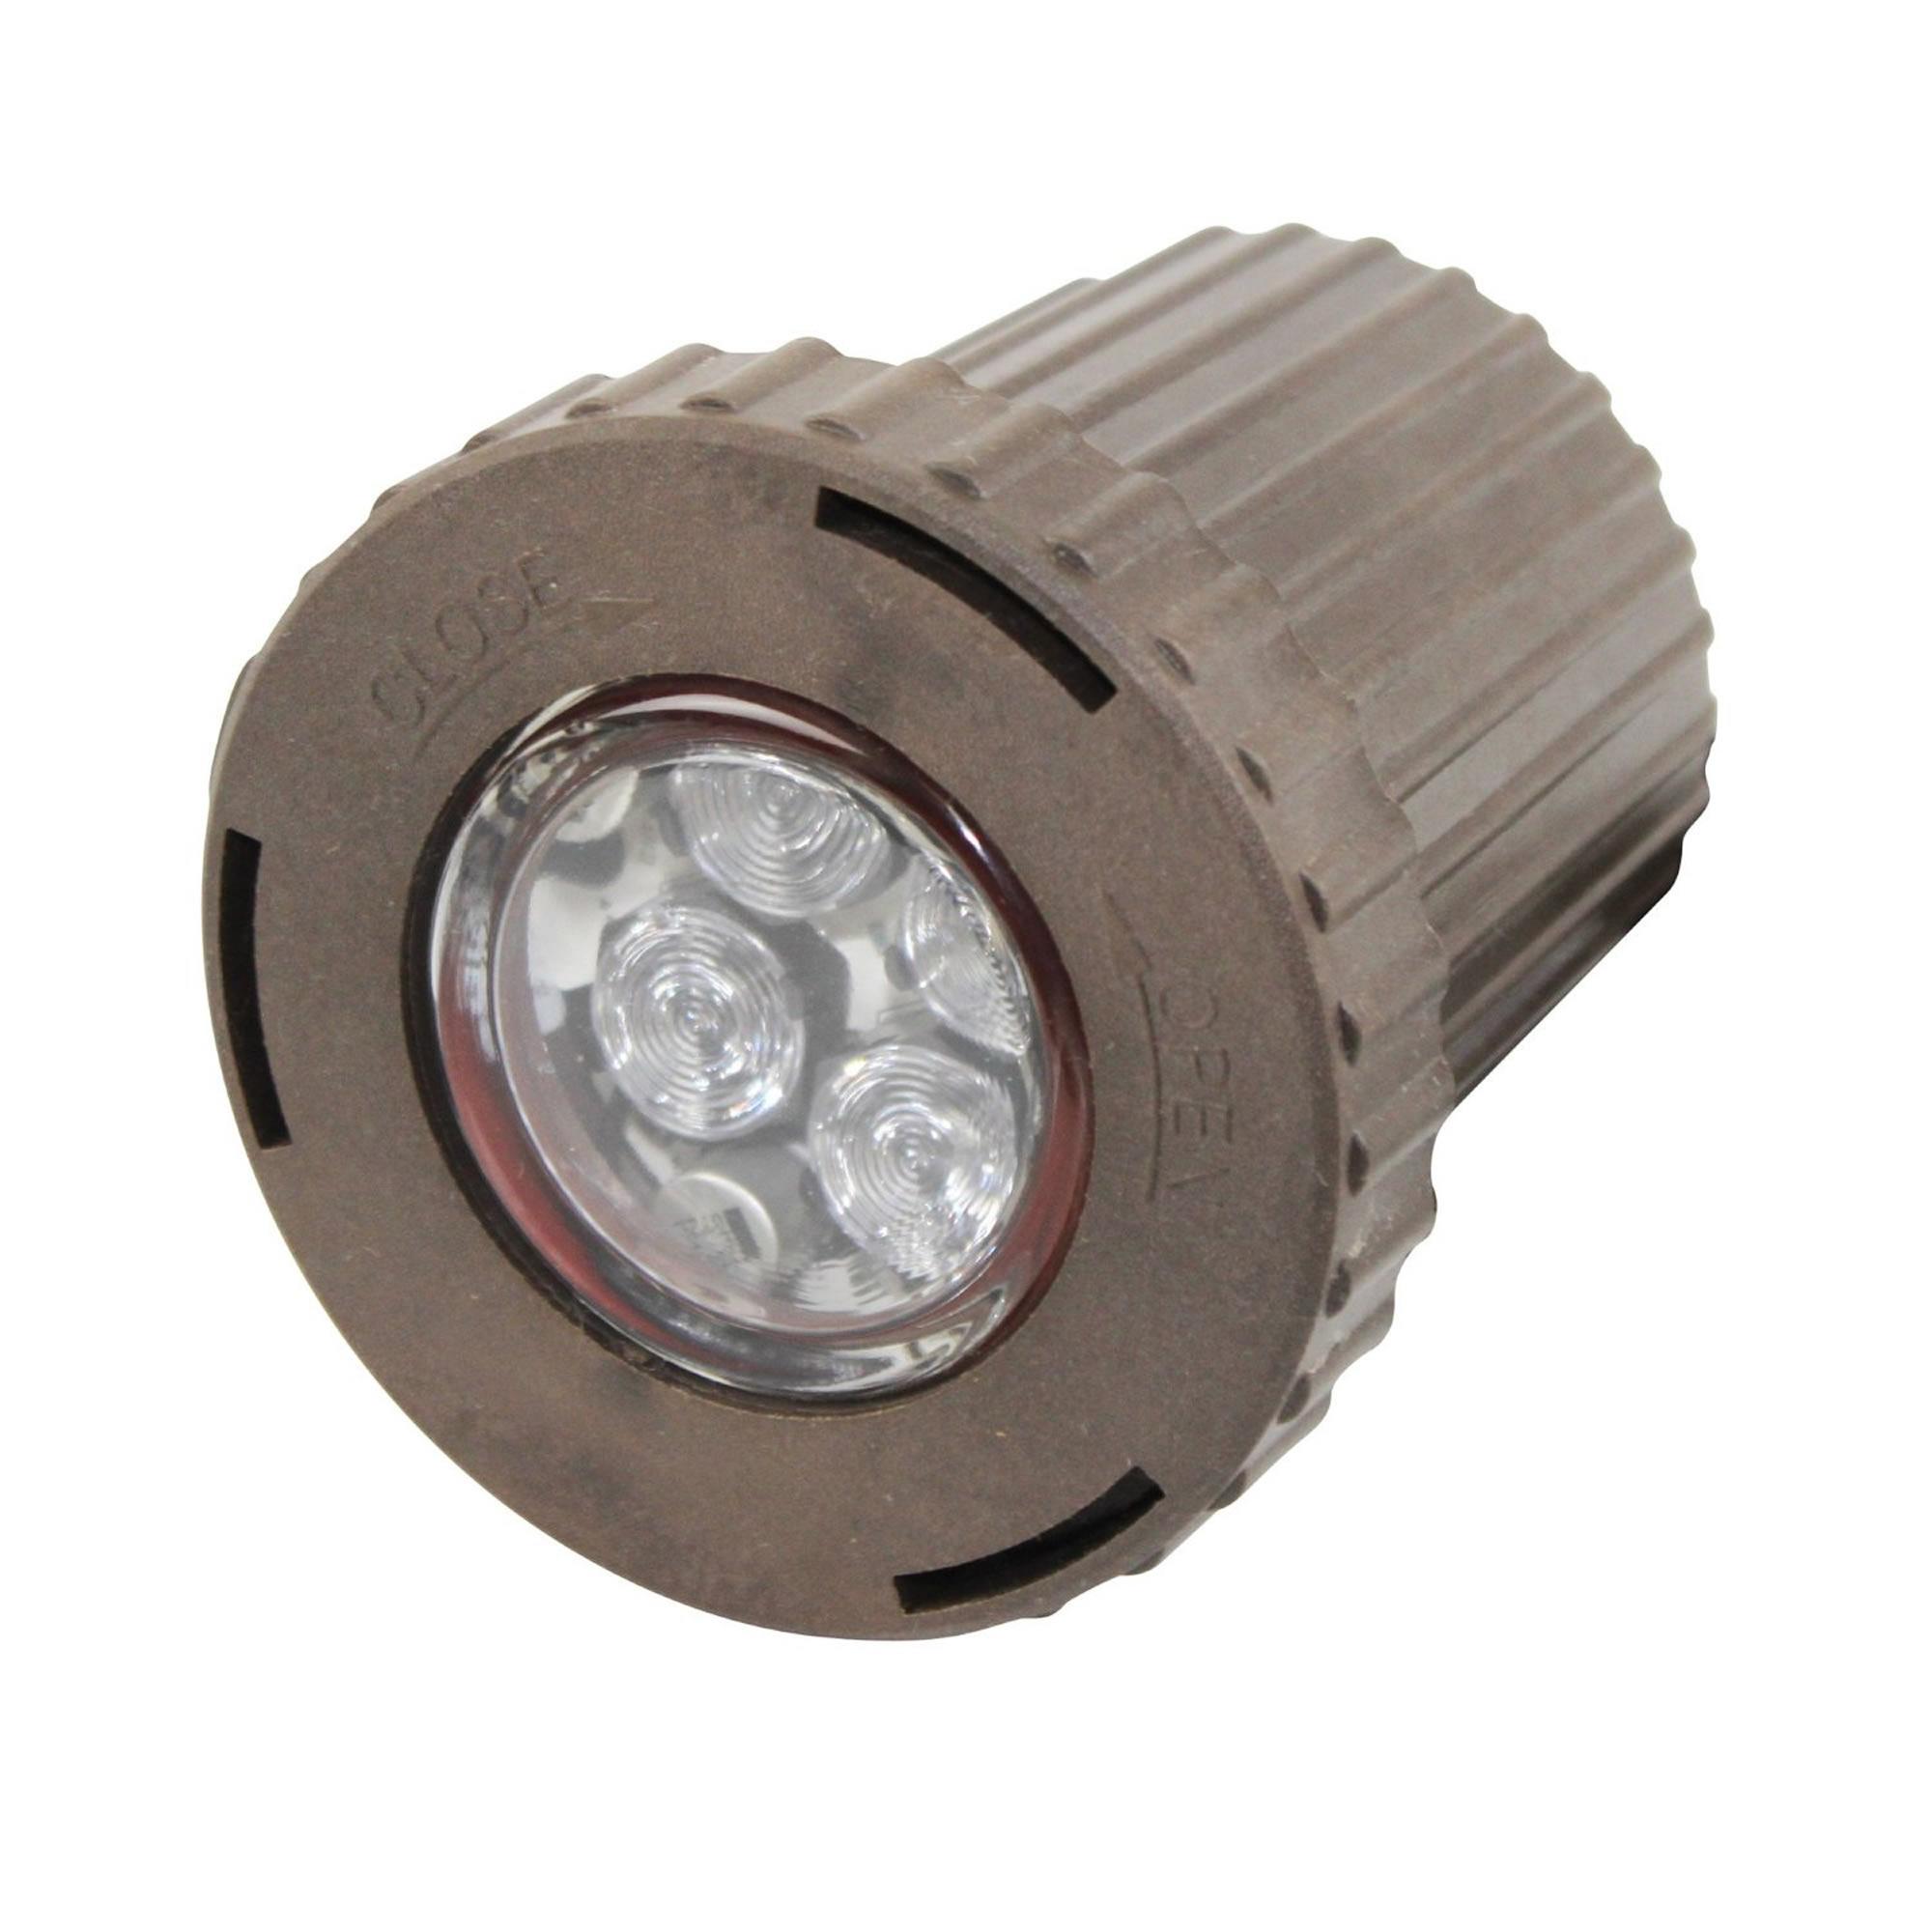 PHILIPS HADCO ILW5D4HW H 12V LED WW LANDSCAPE LED LIGHTING